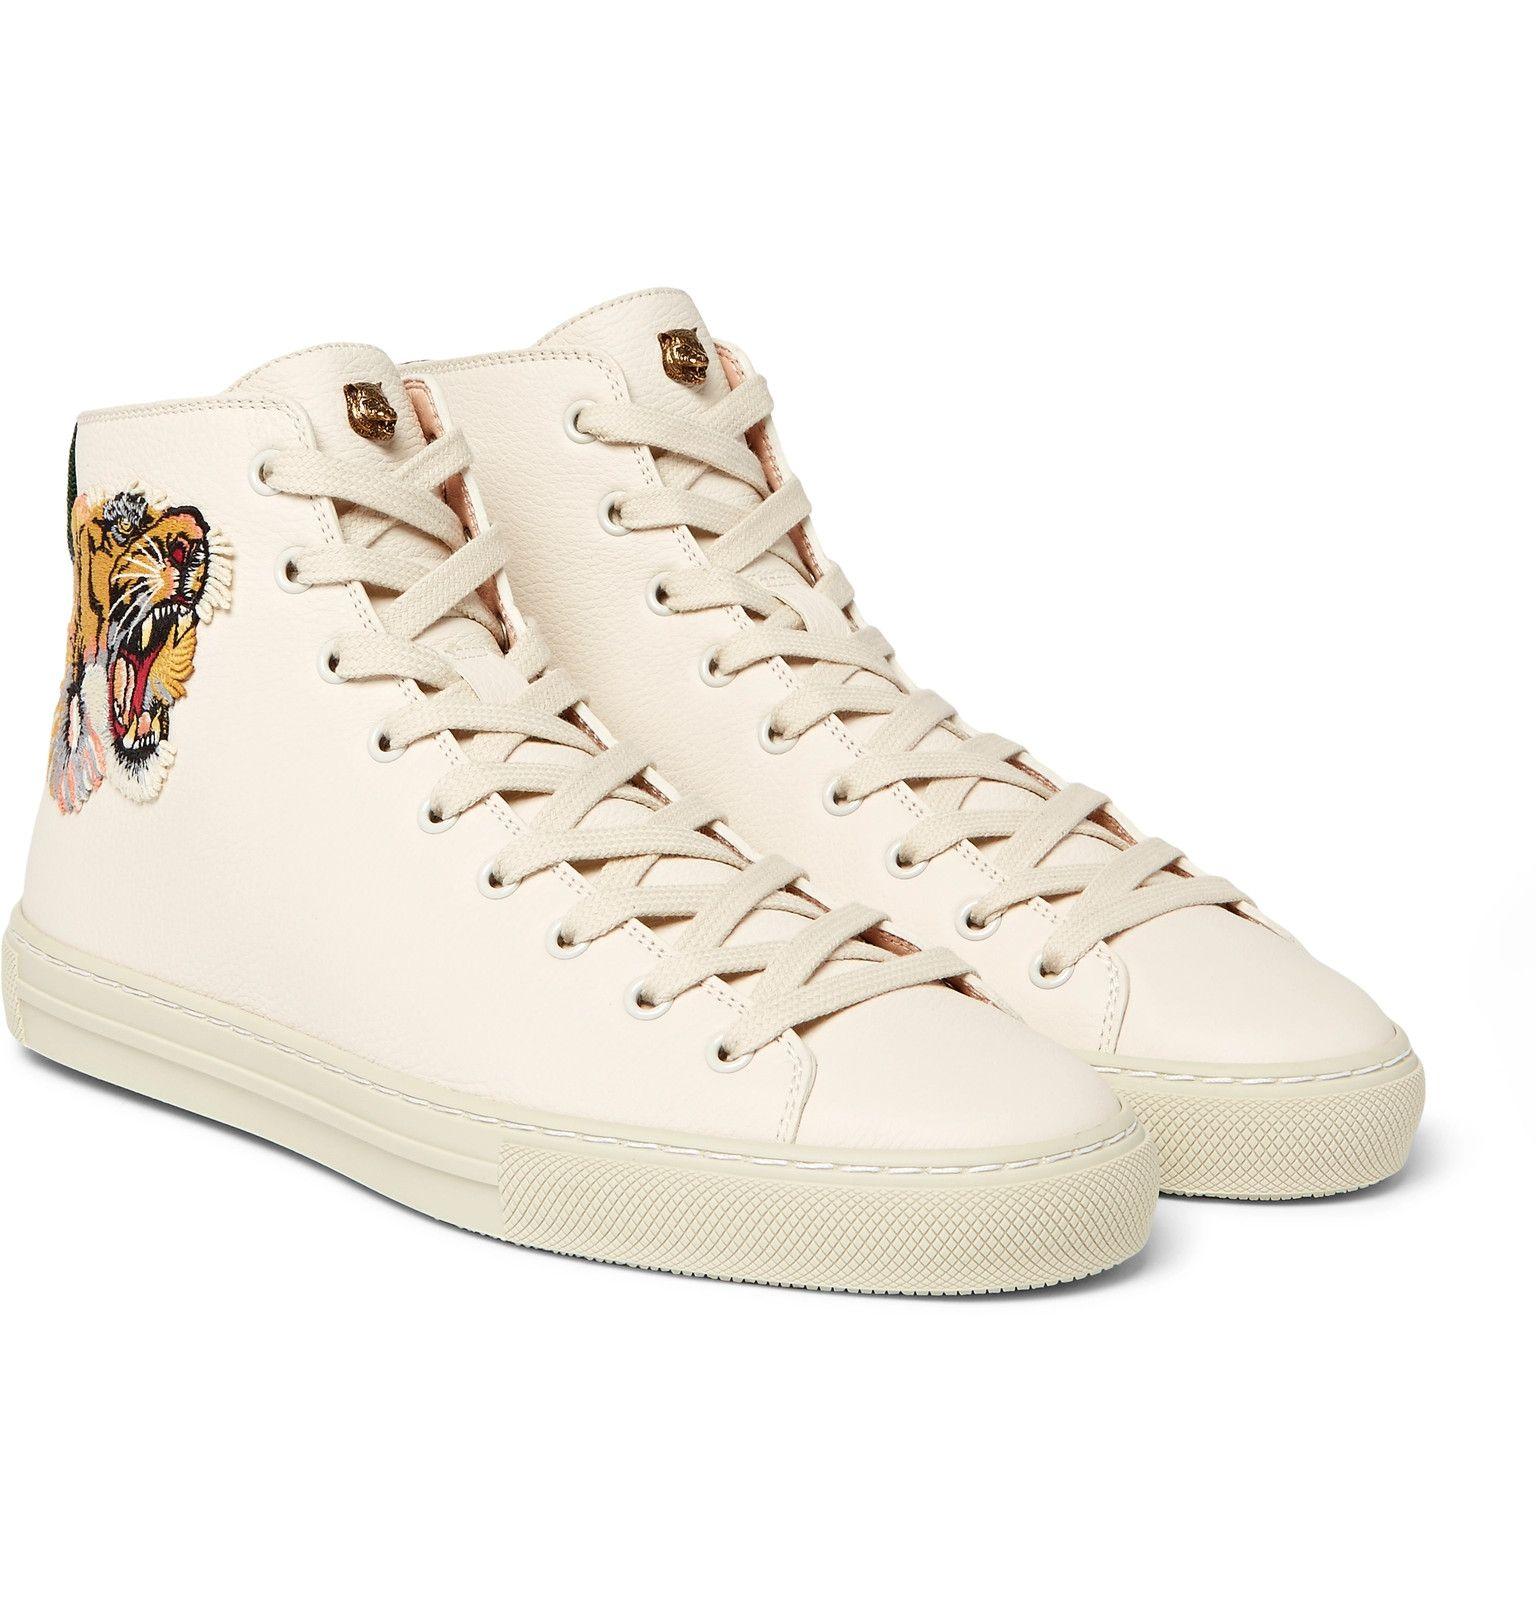 Gucci Major TigerAppliquéd FullGrain Leather HighTop